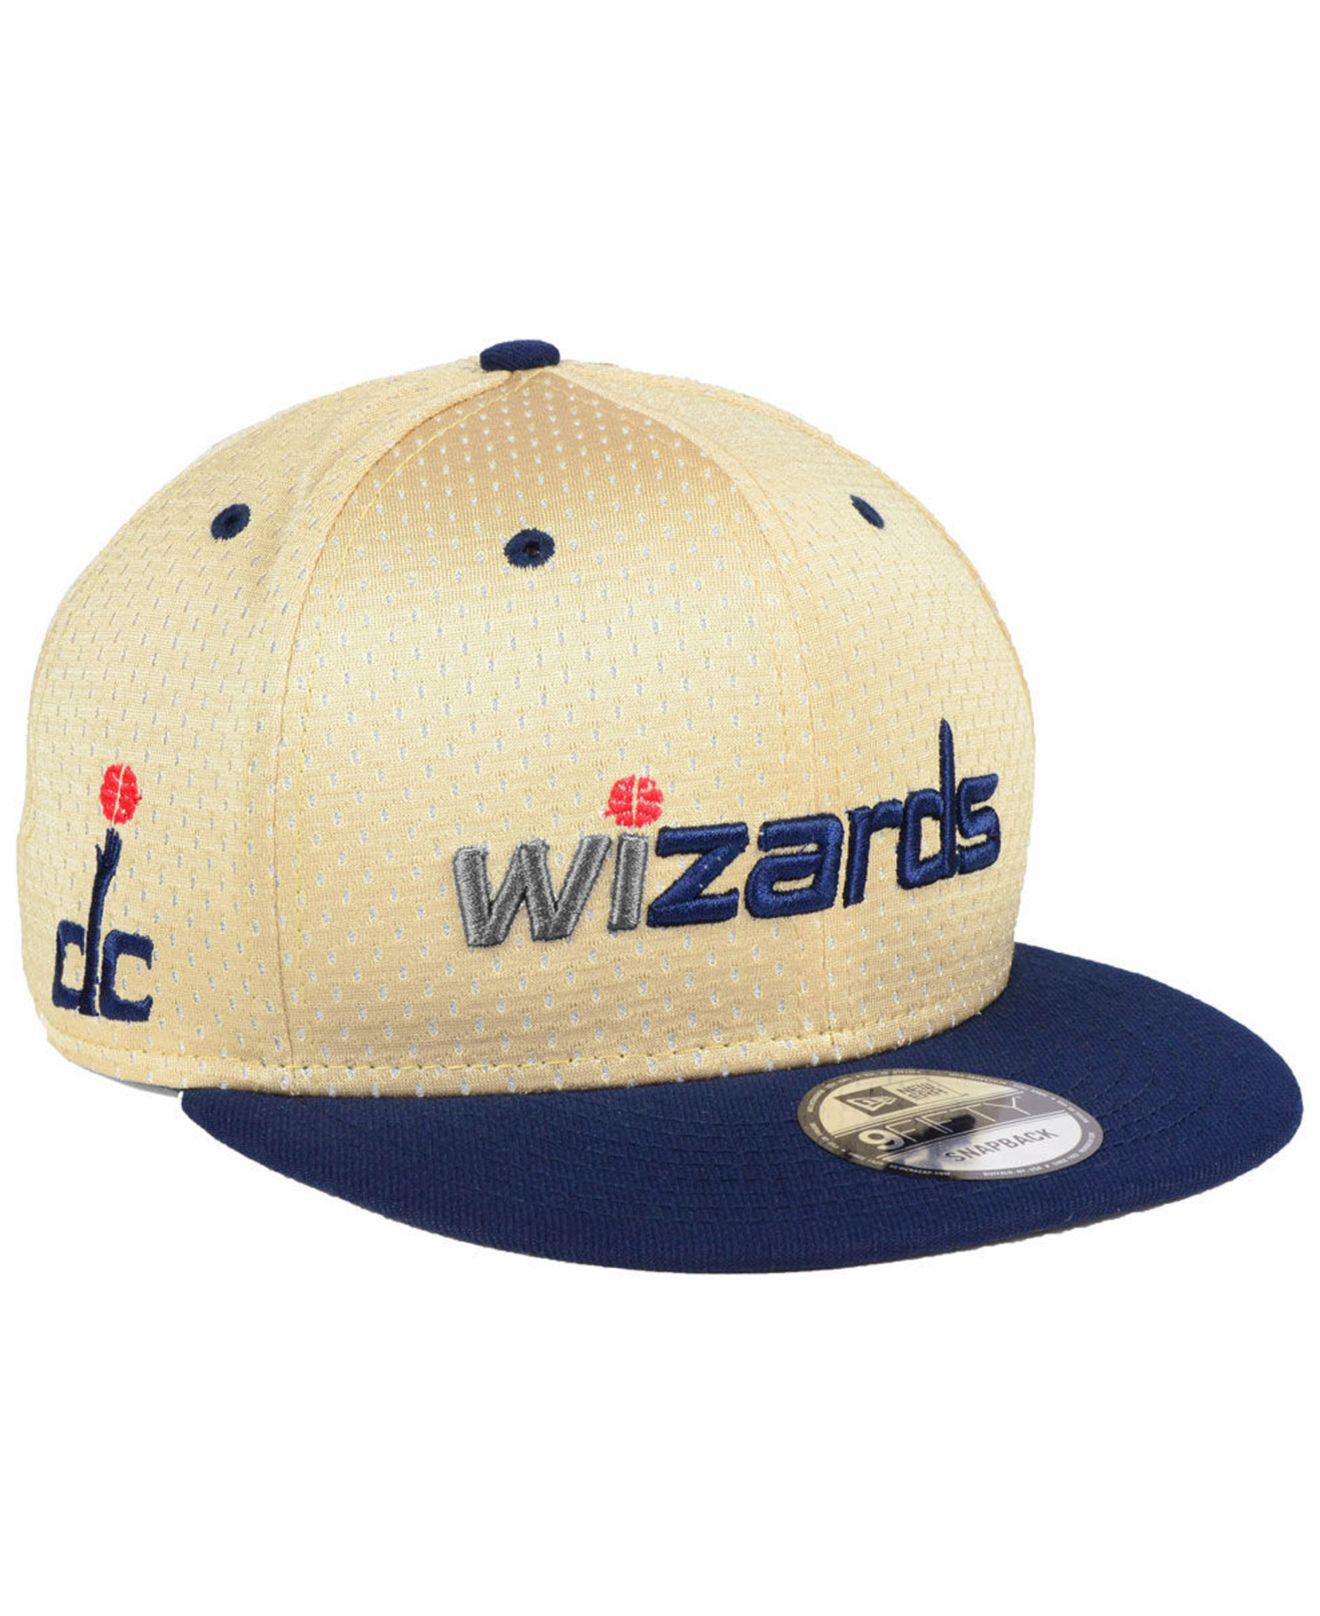 new concept 5fcff 4313e ... denmark ktz. mens blue washington wizards champagne 9fifty snapback cap  3807e fa68f